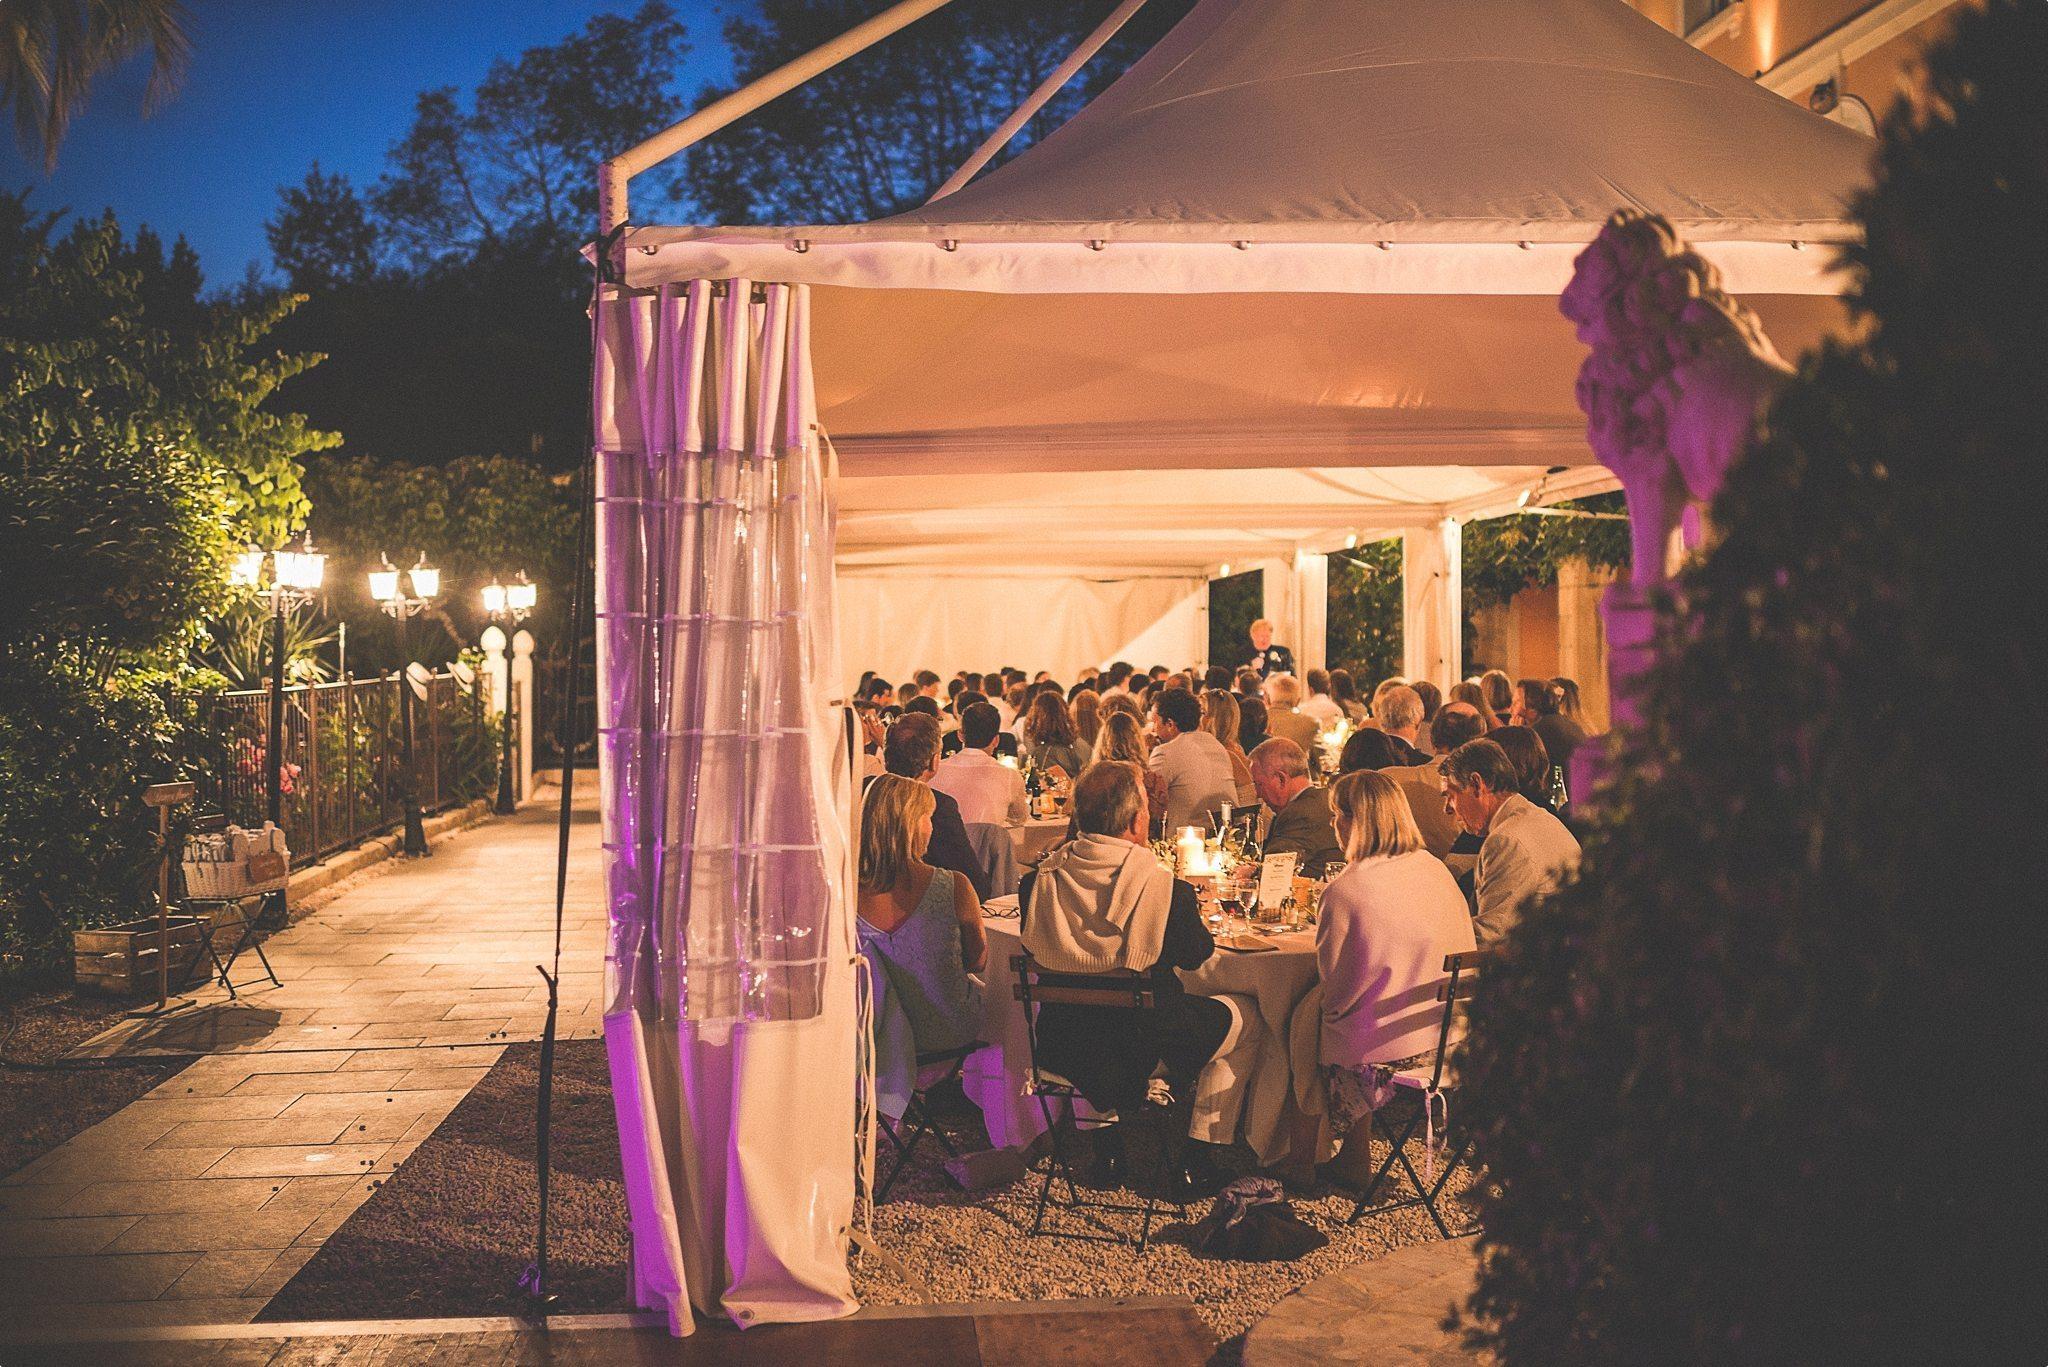 Domaine de la Croix Hotel L'Orangerie South of France vineyard and beach Wedding - Maria Assia Photography-479